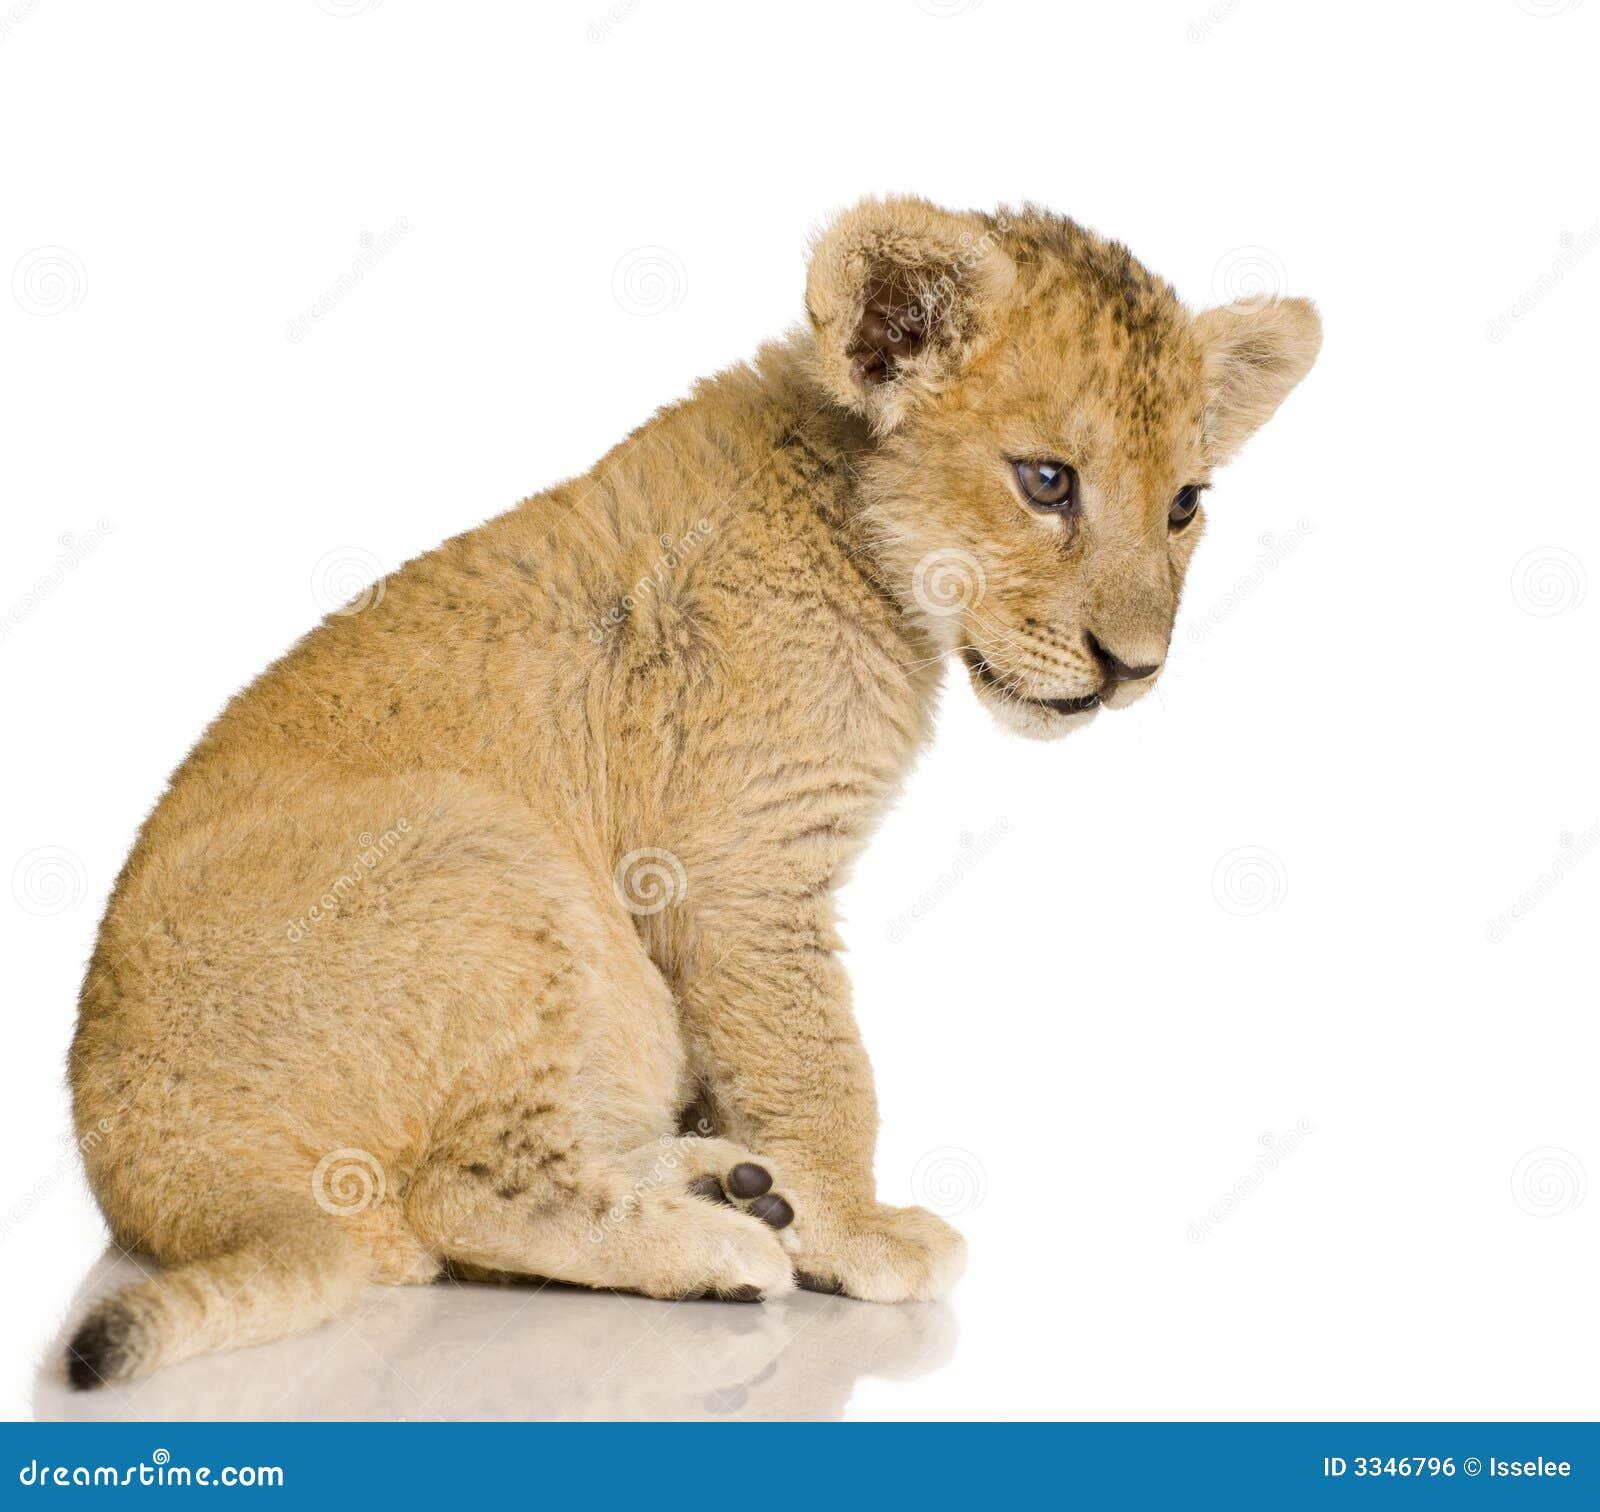 Lion sitting profile - photo#45